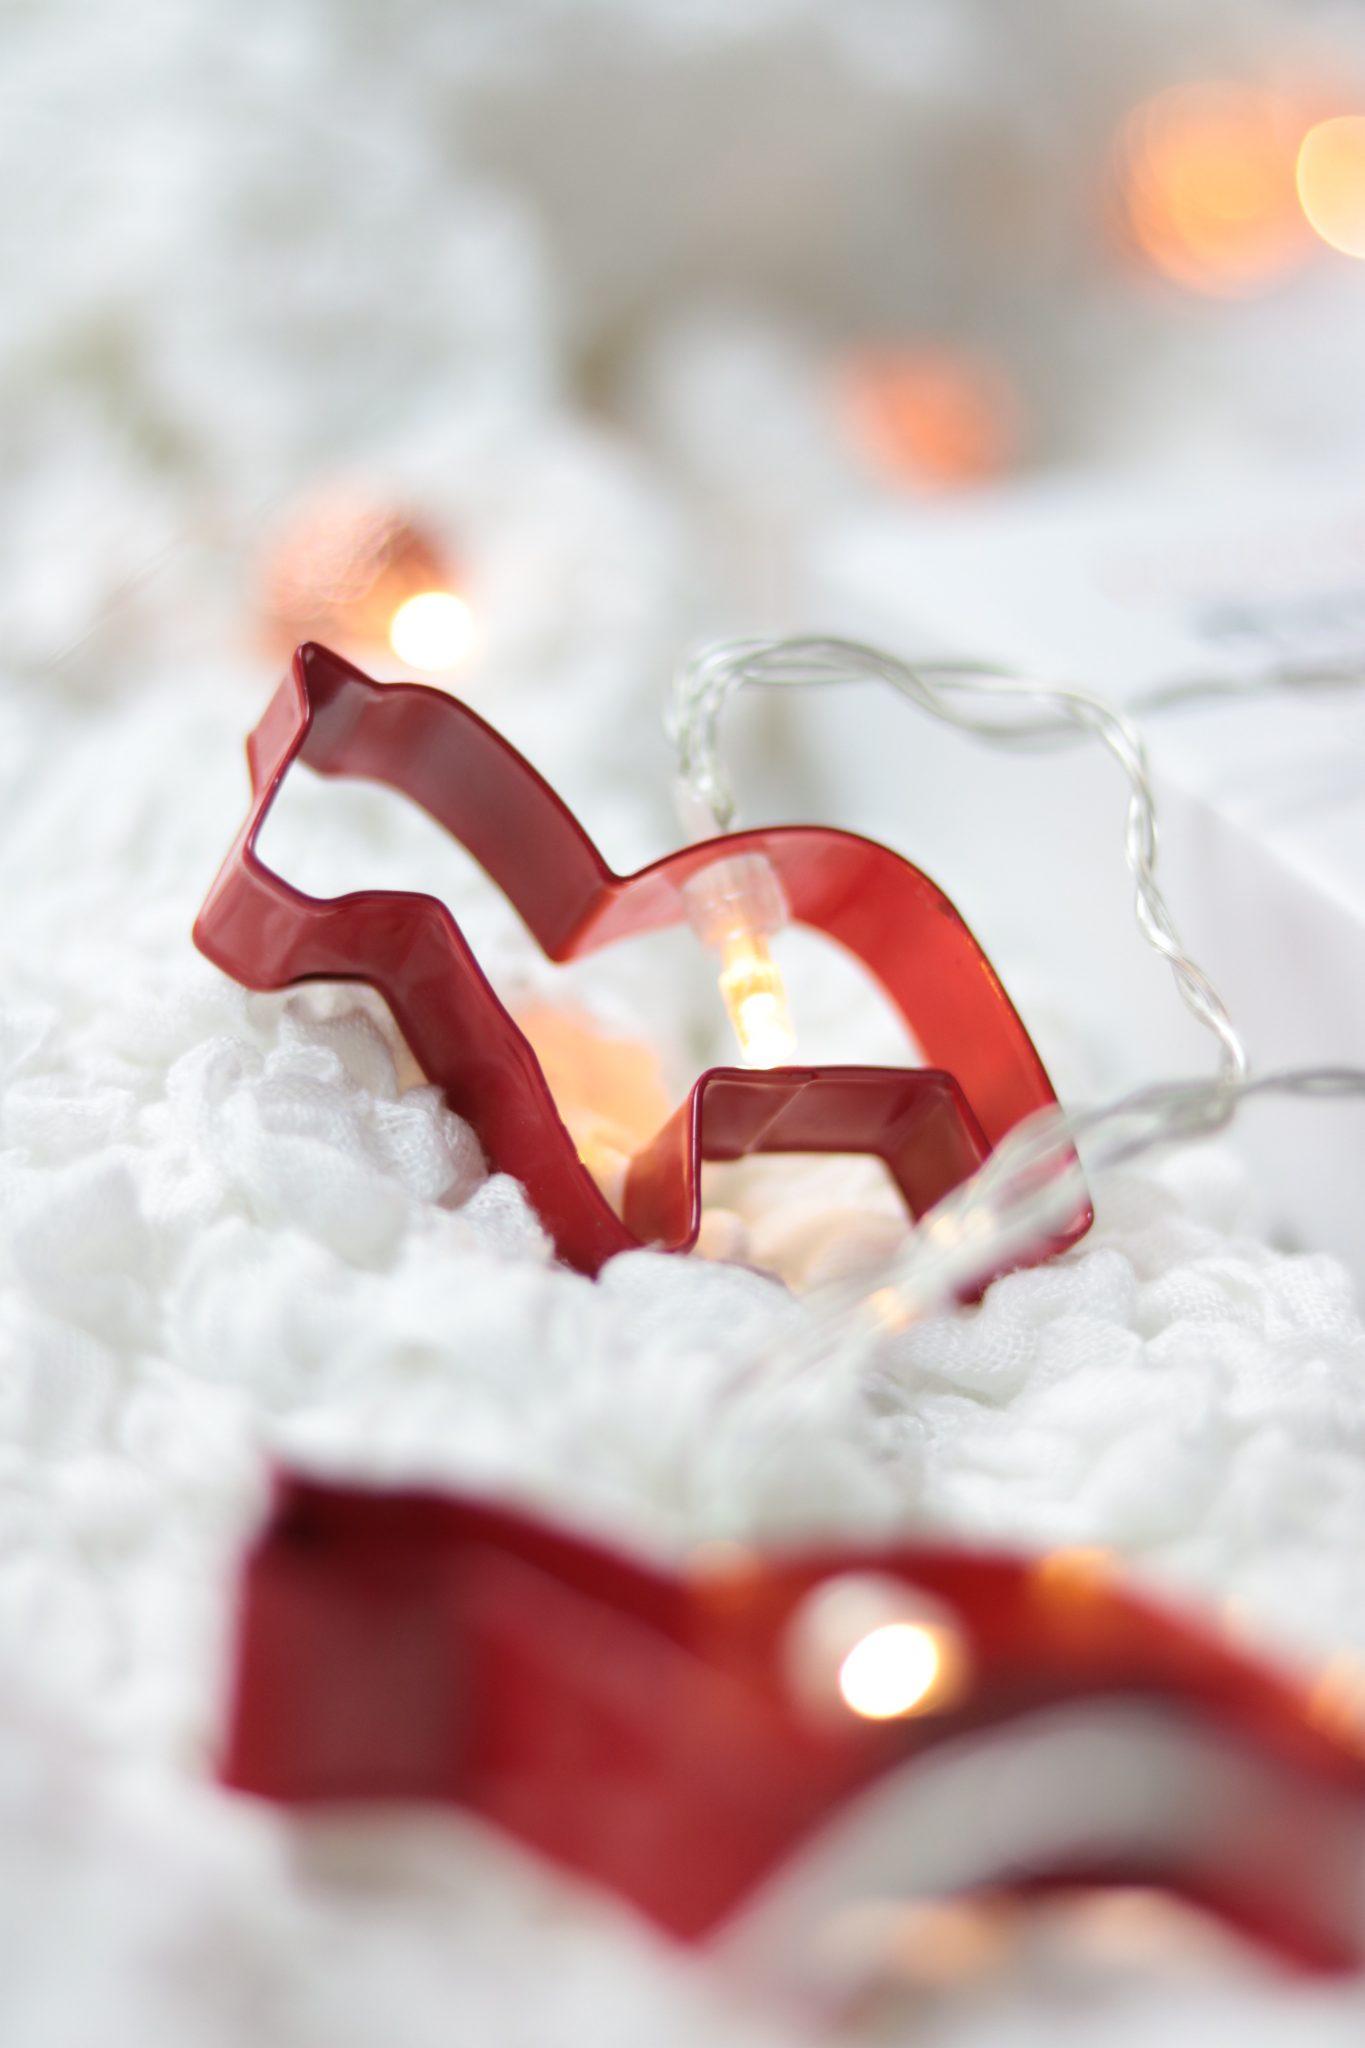 diy-adventskalender-geschenke-originell-verpacken